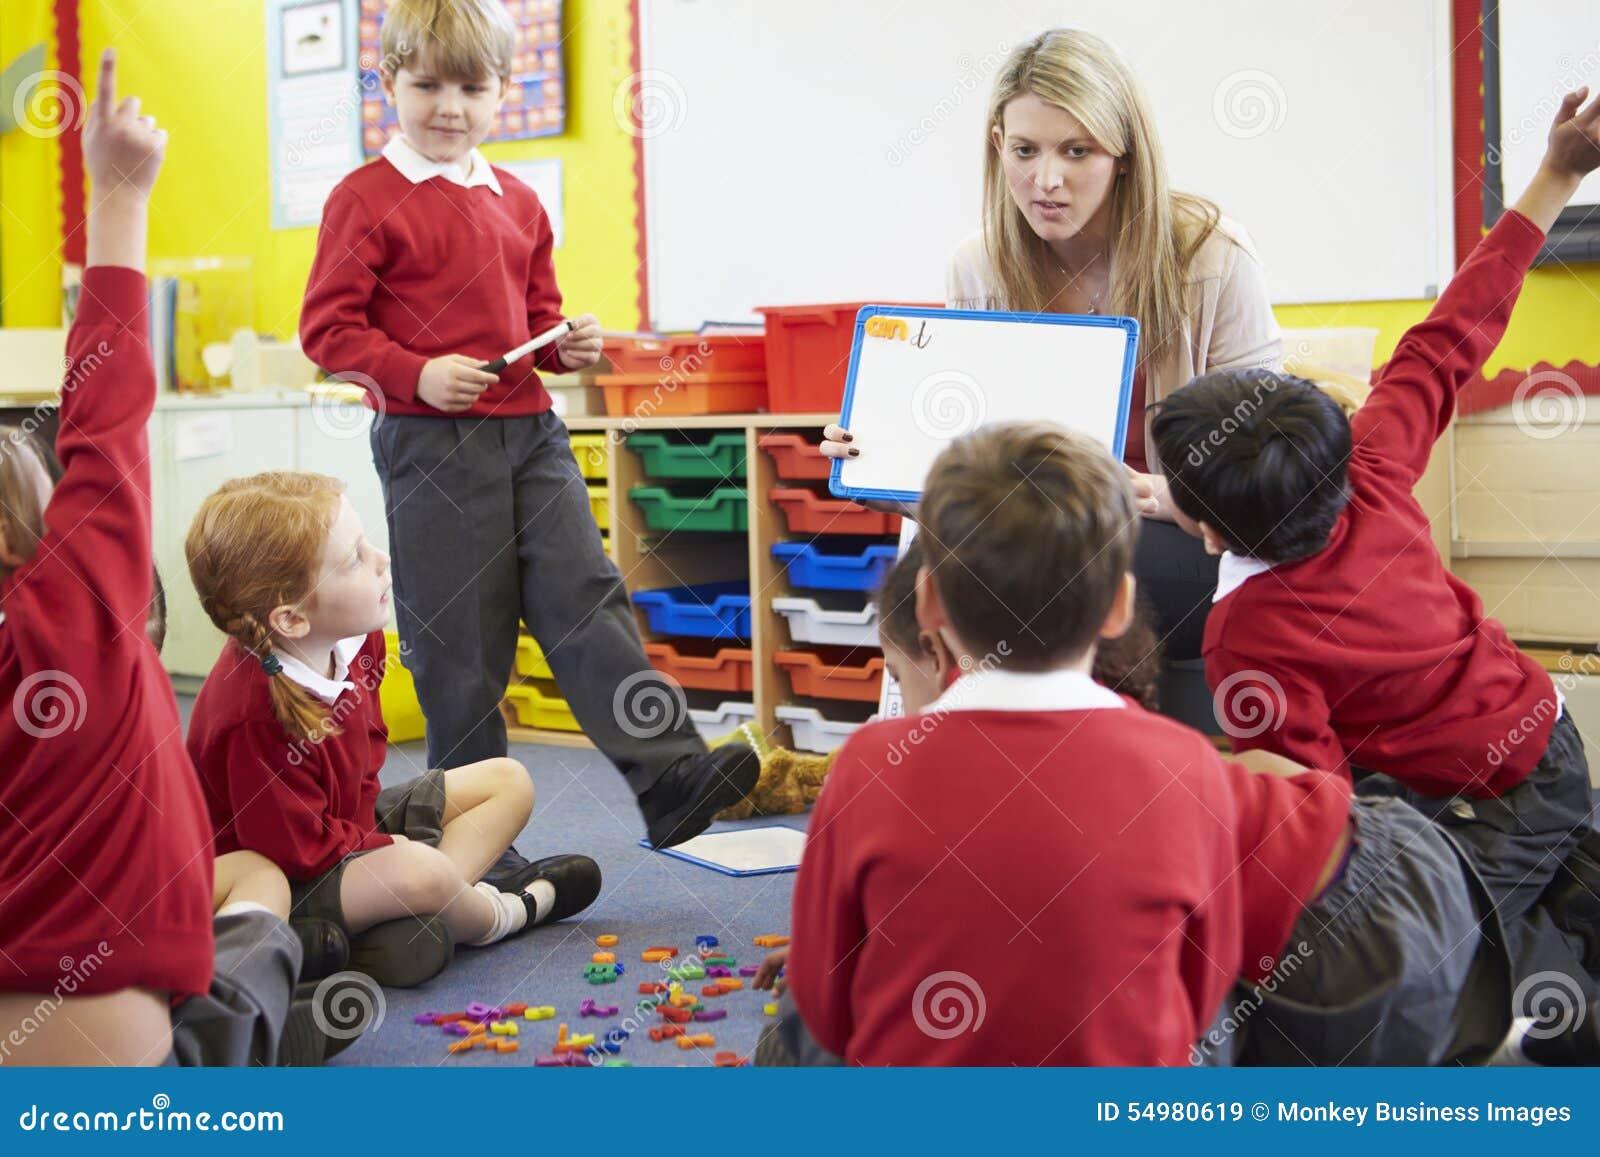 Teacher Teaching Spelling To Elementary School Pupils